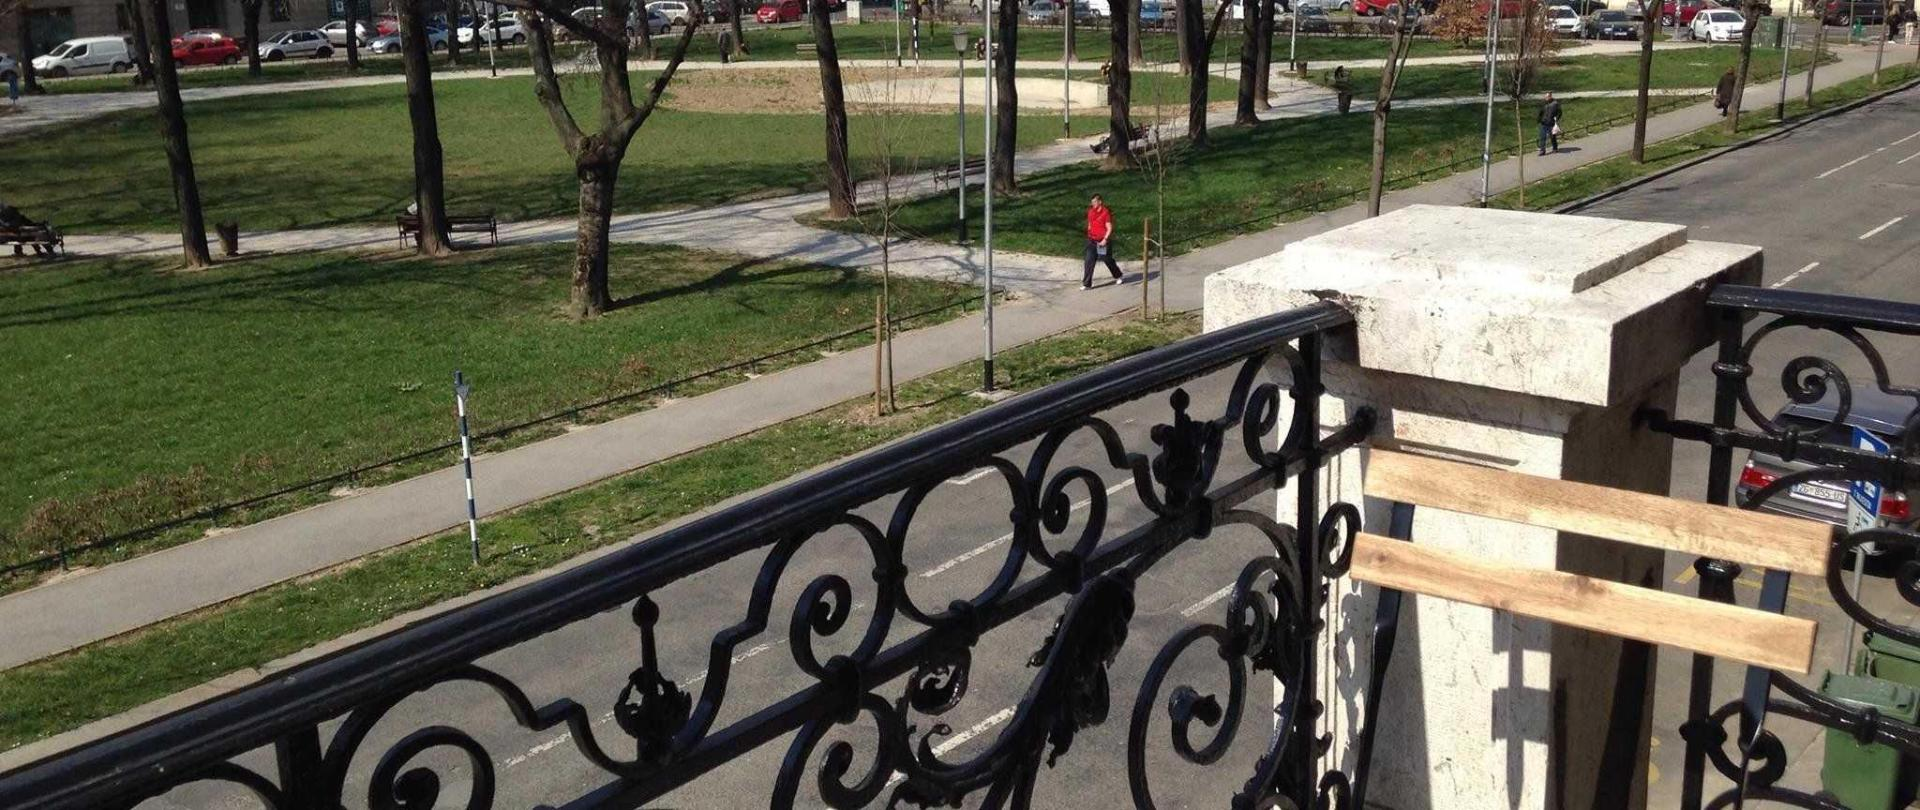 balcony-street-view.jpg